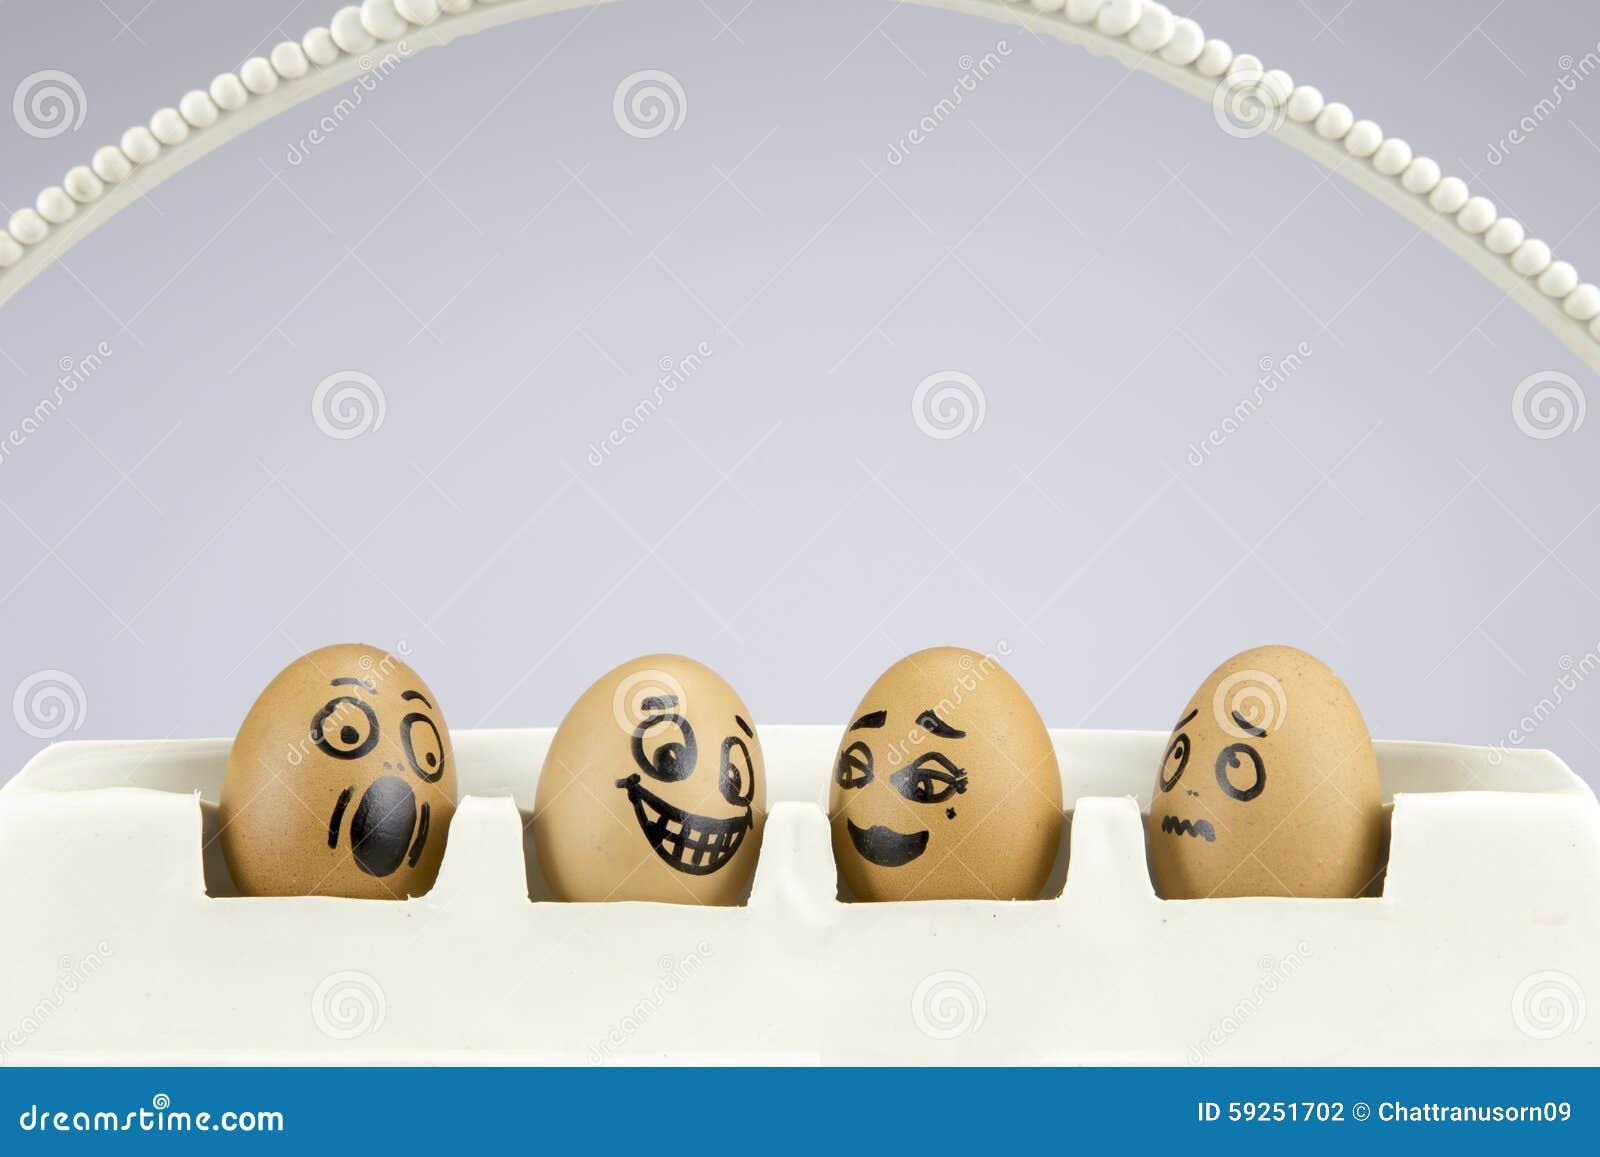 funny eggs emotion mood - photo #26